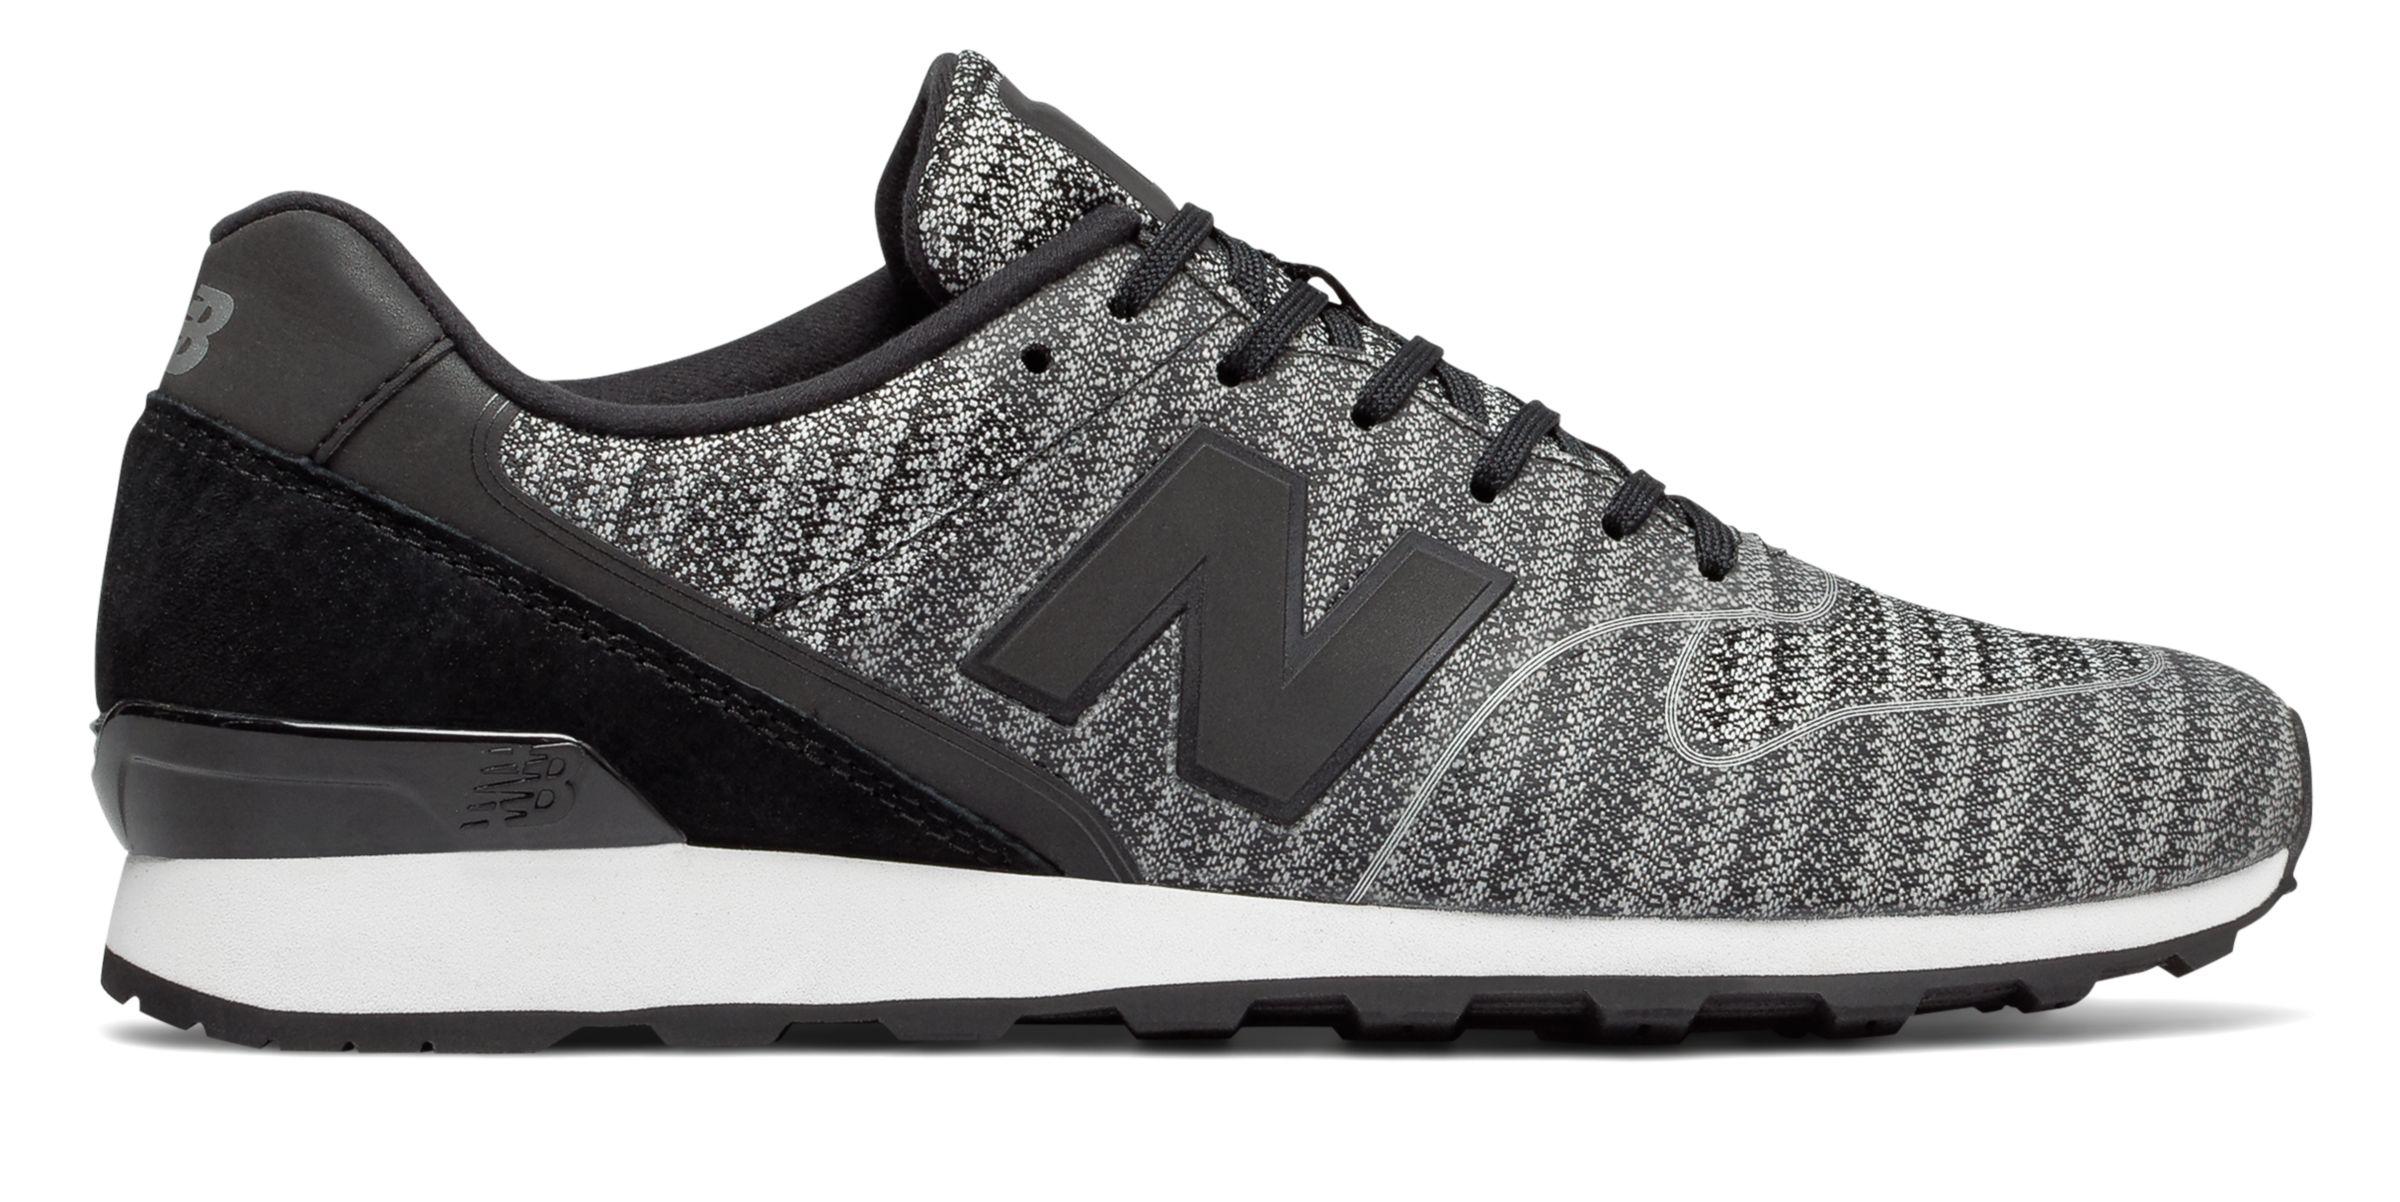 NB 996 New Balance, Black with Grey